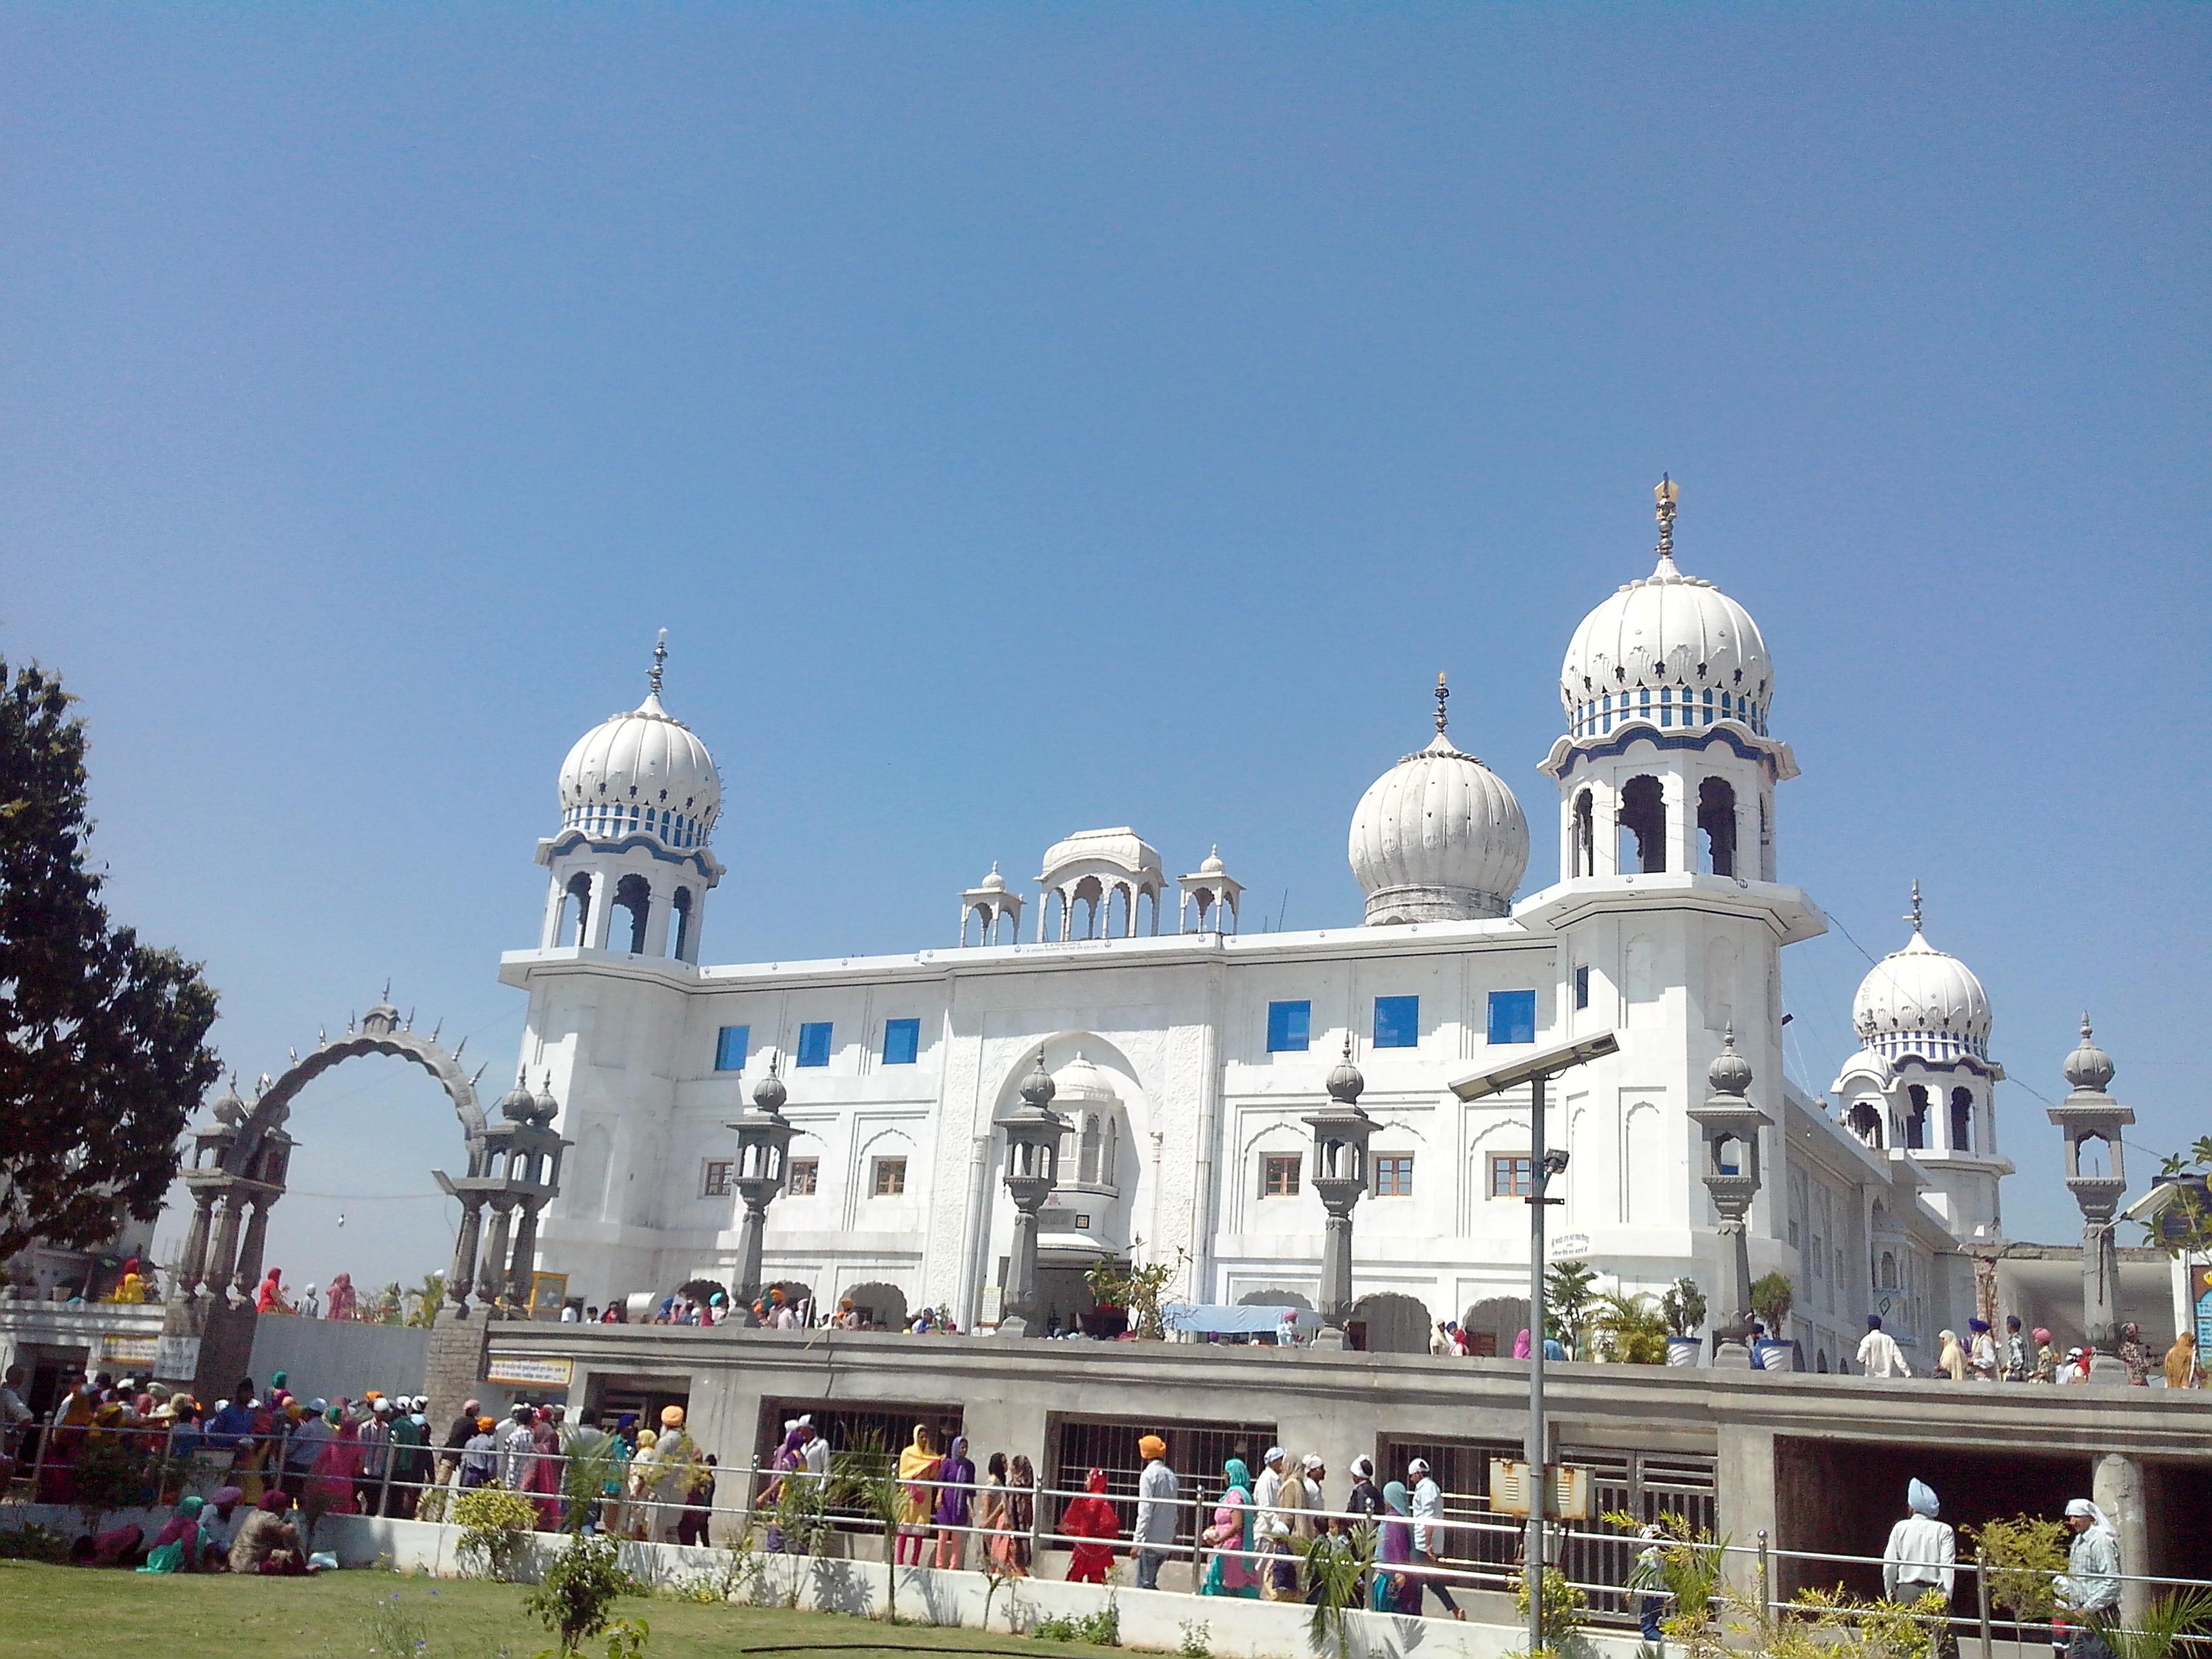 Ambala India  city photos gallery : Visitor attractions[edit] Ambala, India